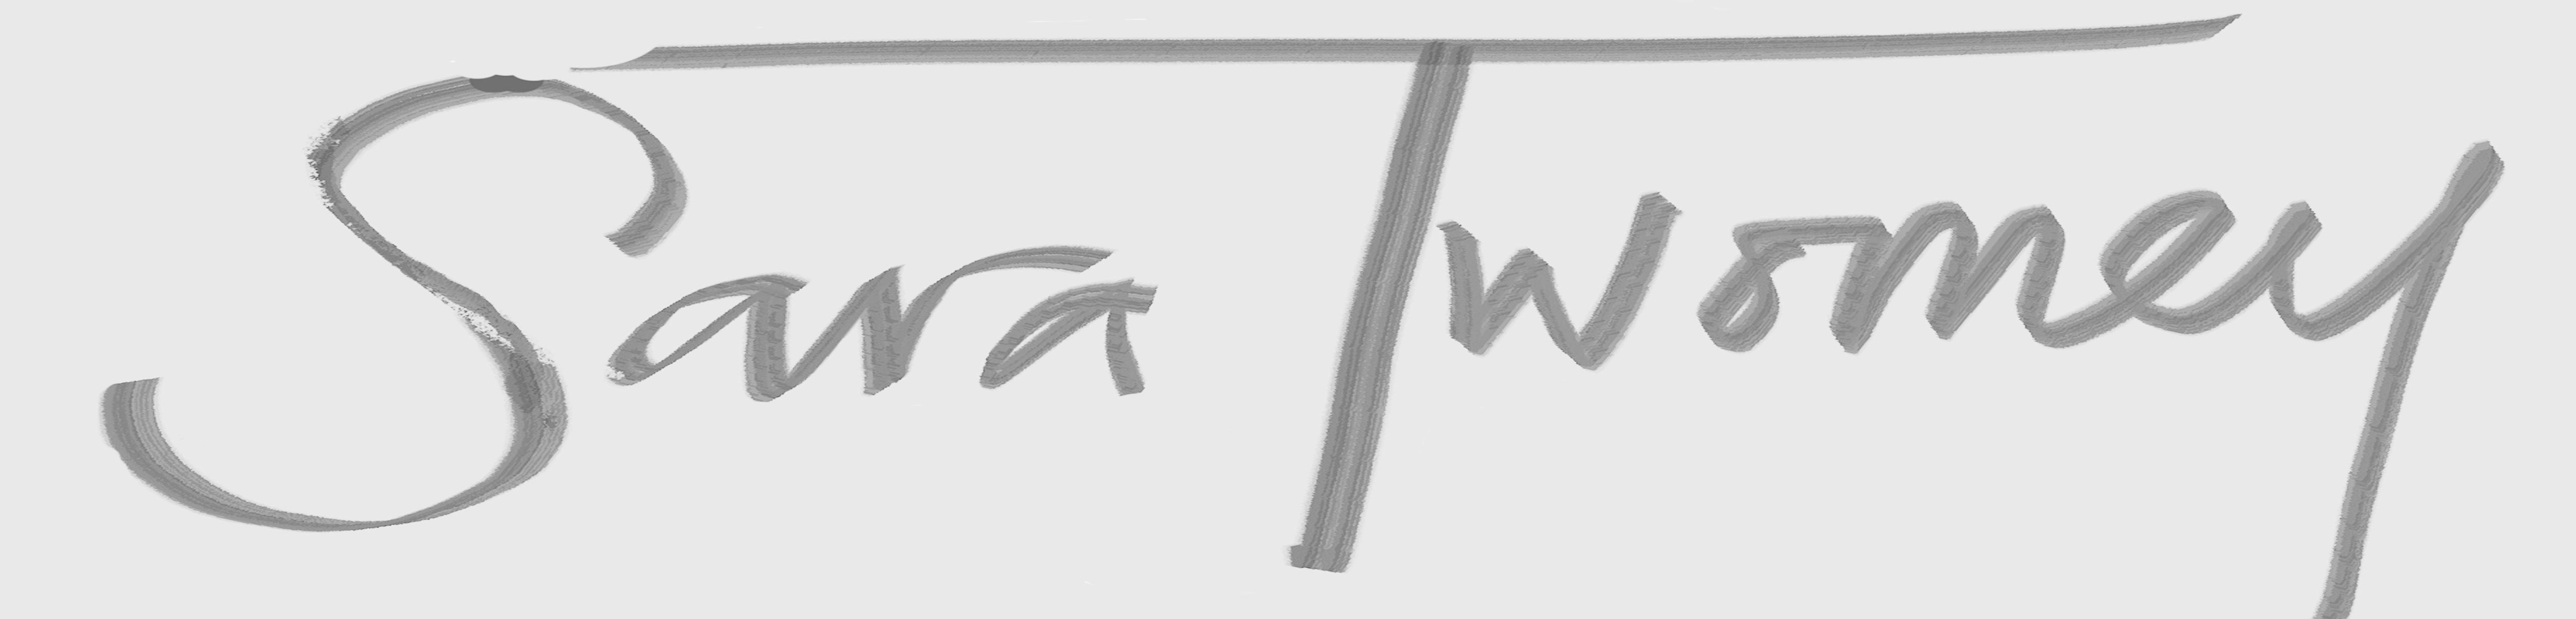 Sara Twomey Signature